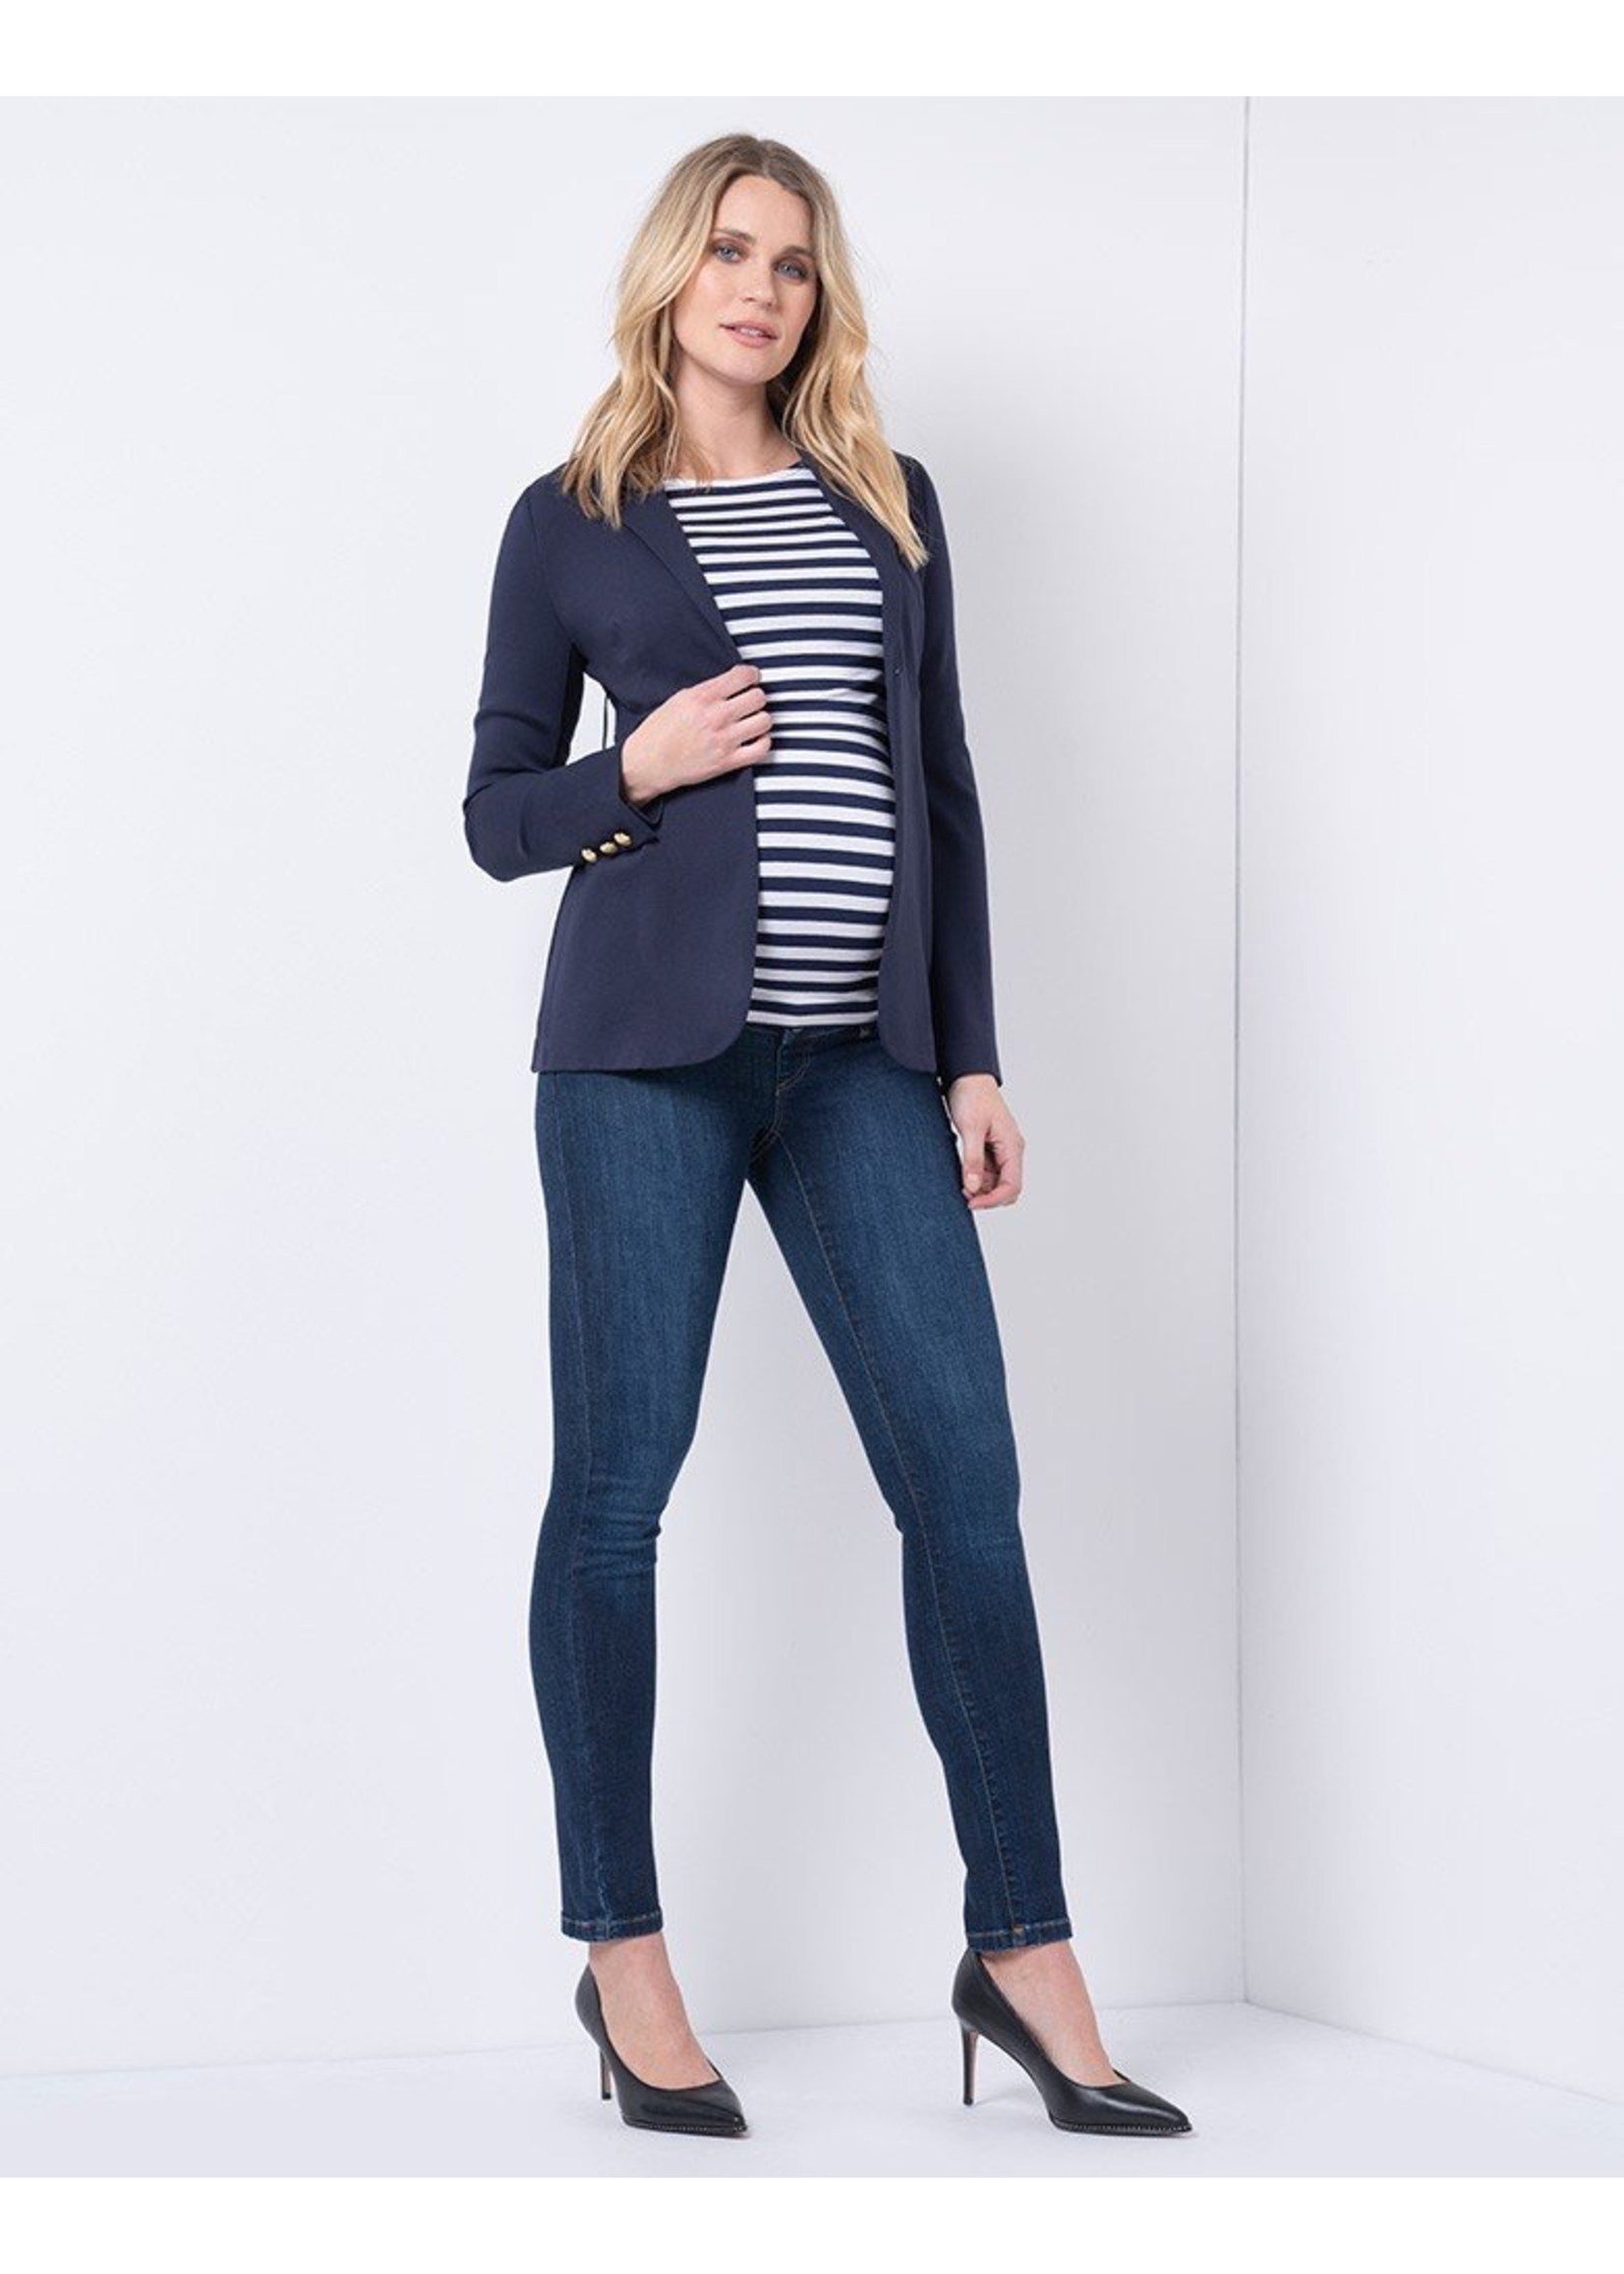 Seraphine Seraphine, Marcus, Organic Cotton Over Bump Maternity Dark Blue Jeans